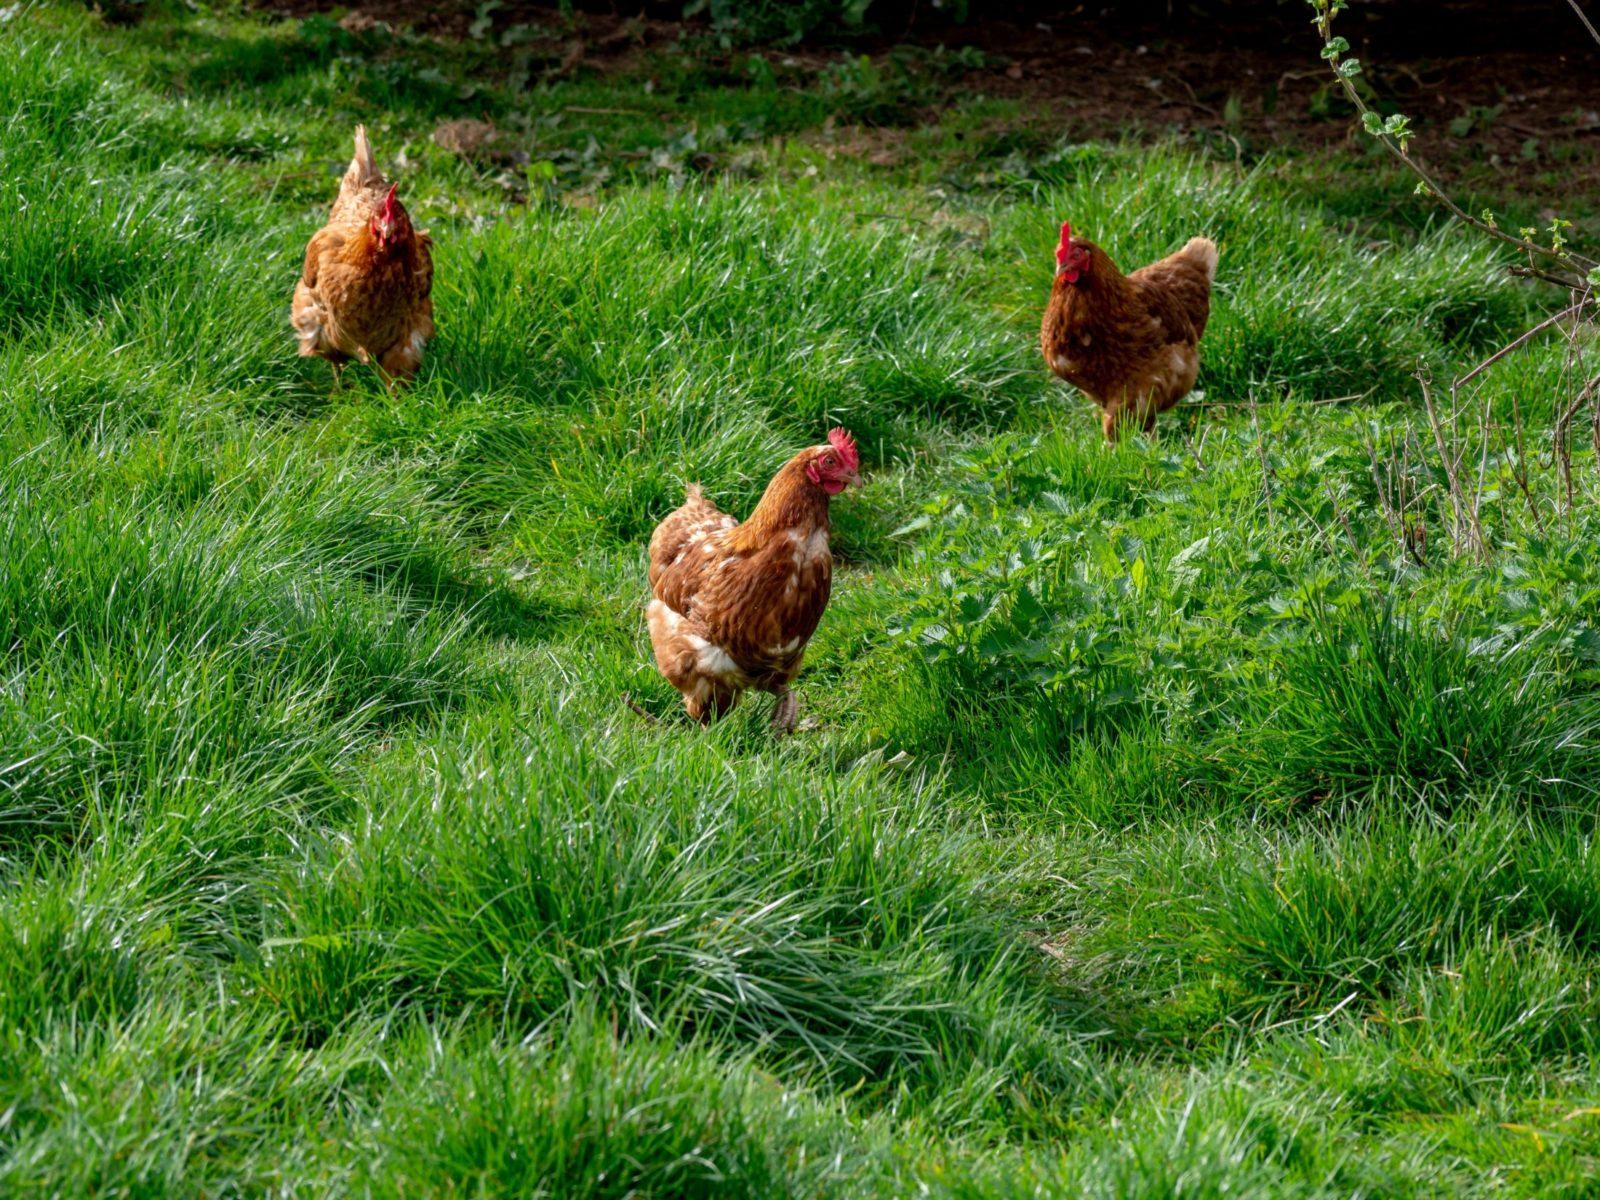 Sonhar com frango sendo comprado é sinal de fase despreocupada.